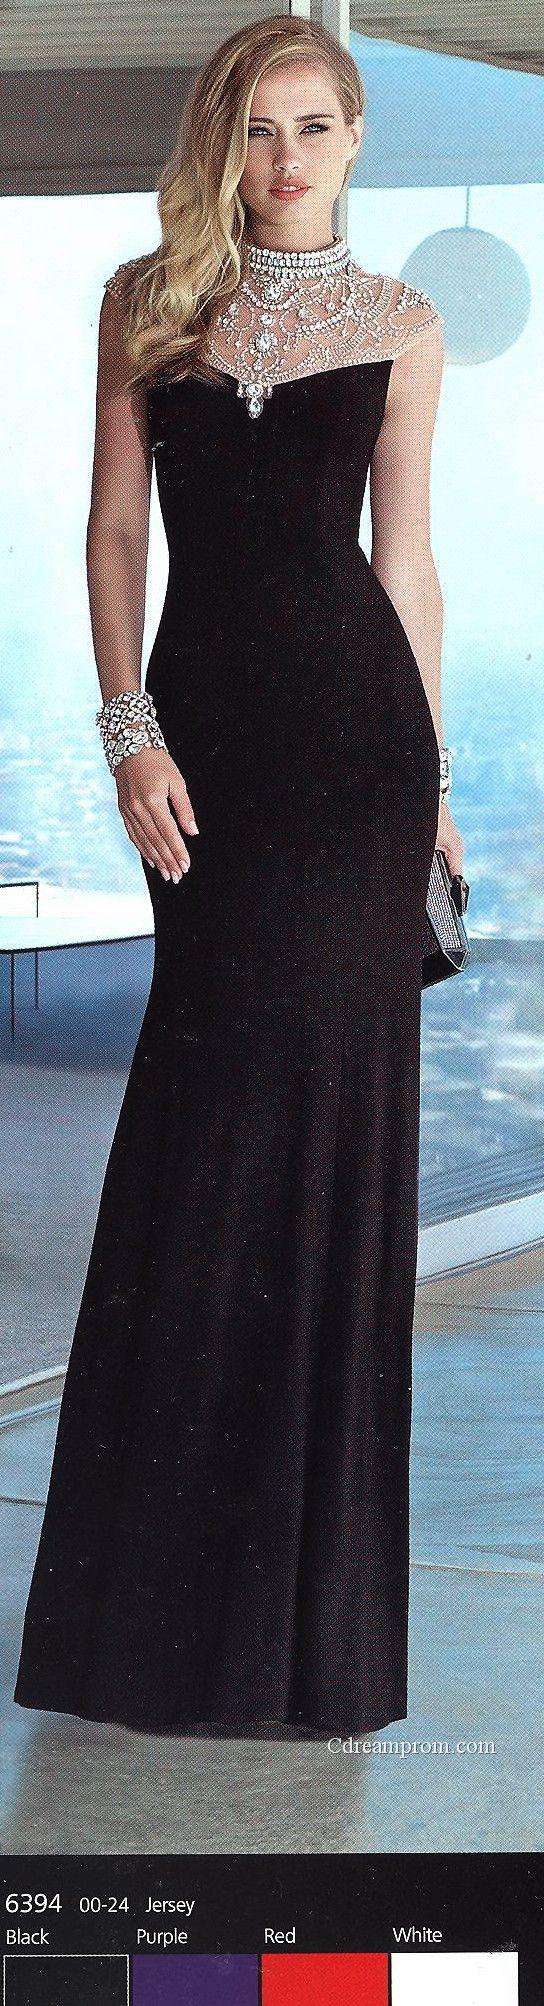 Elegant evening dress jolie dresses pinterest elegant prom